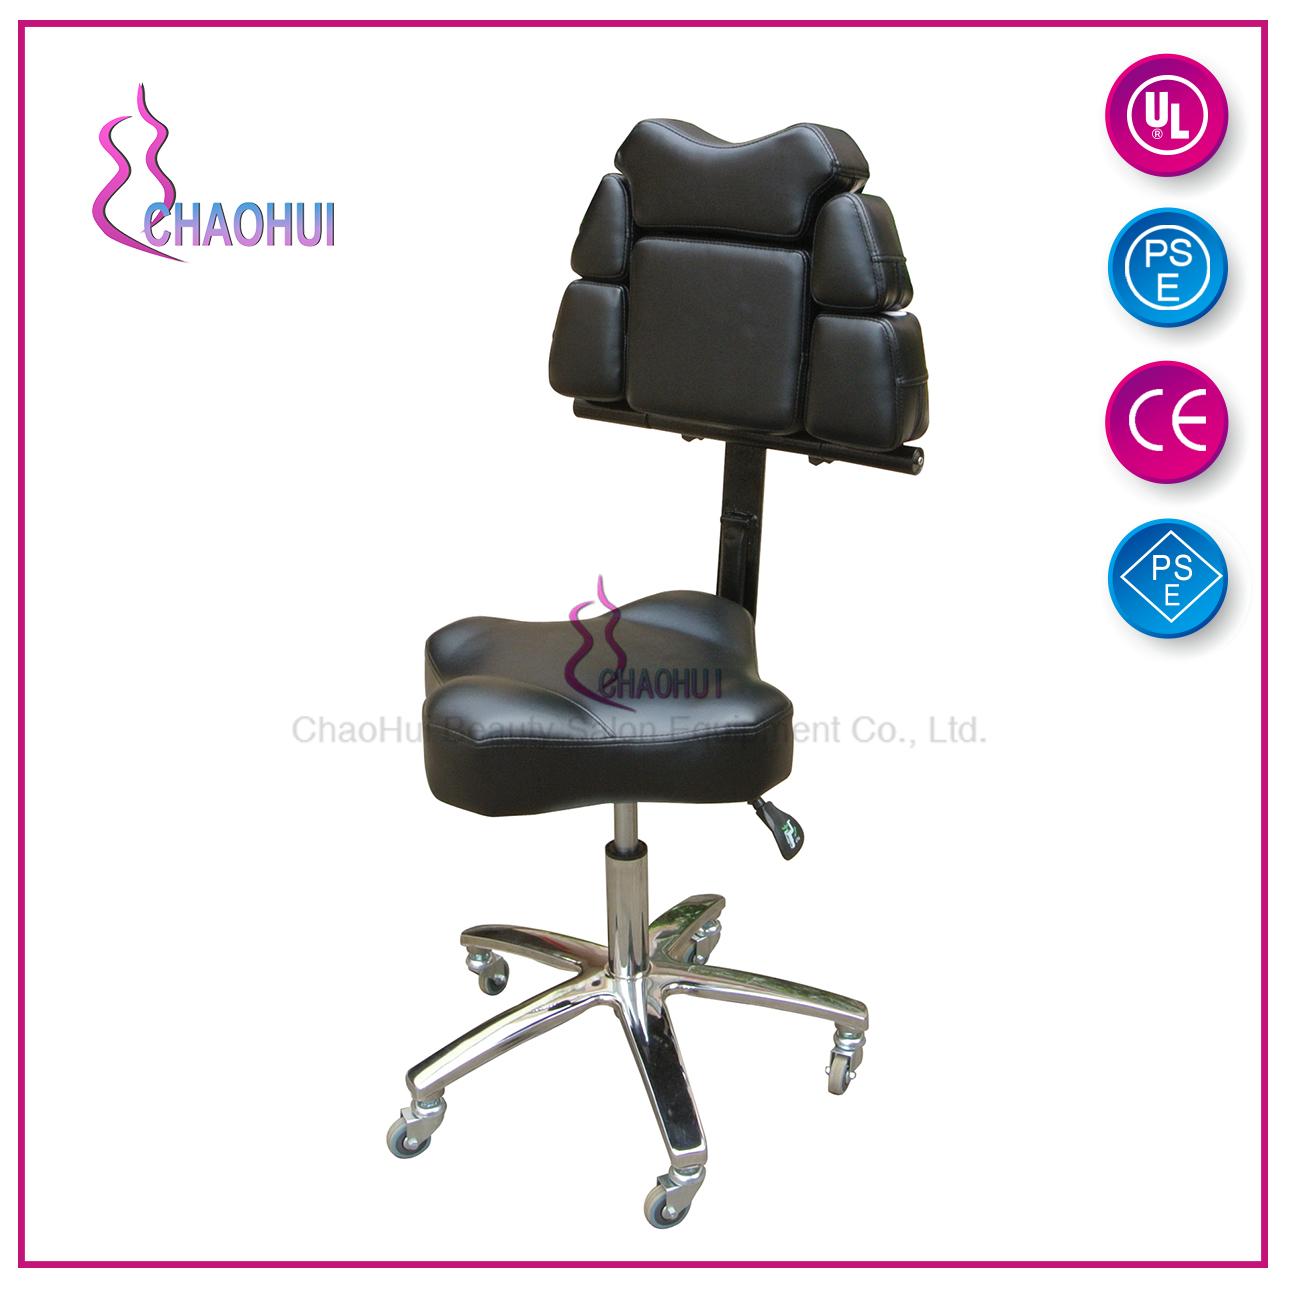 油压椅CH 890